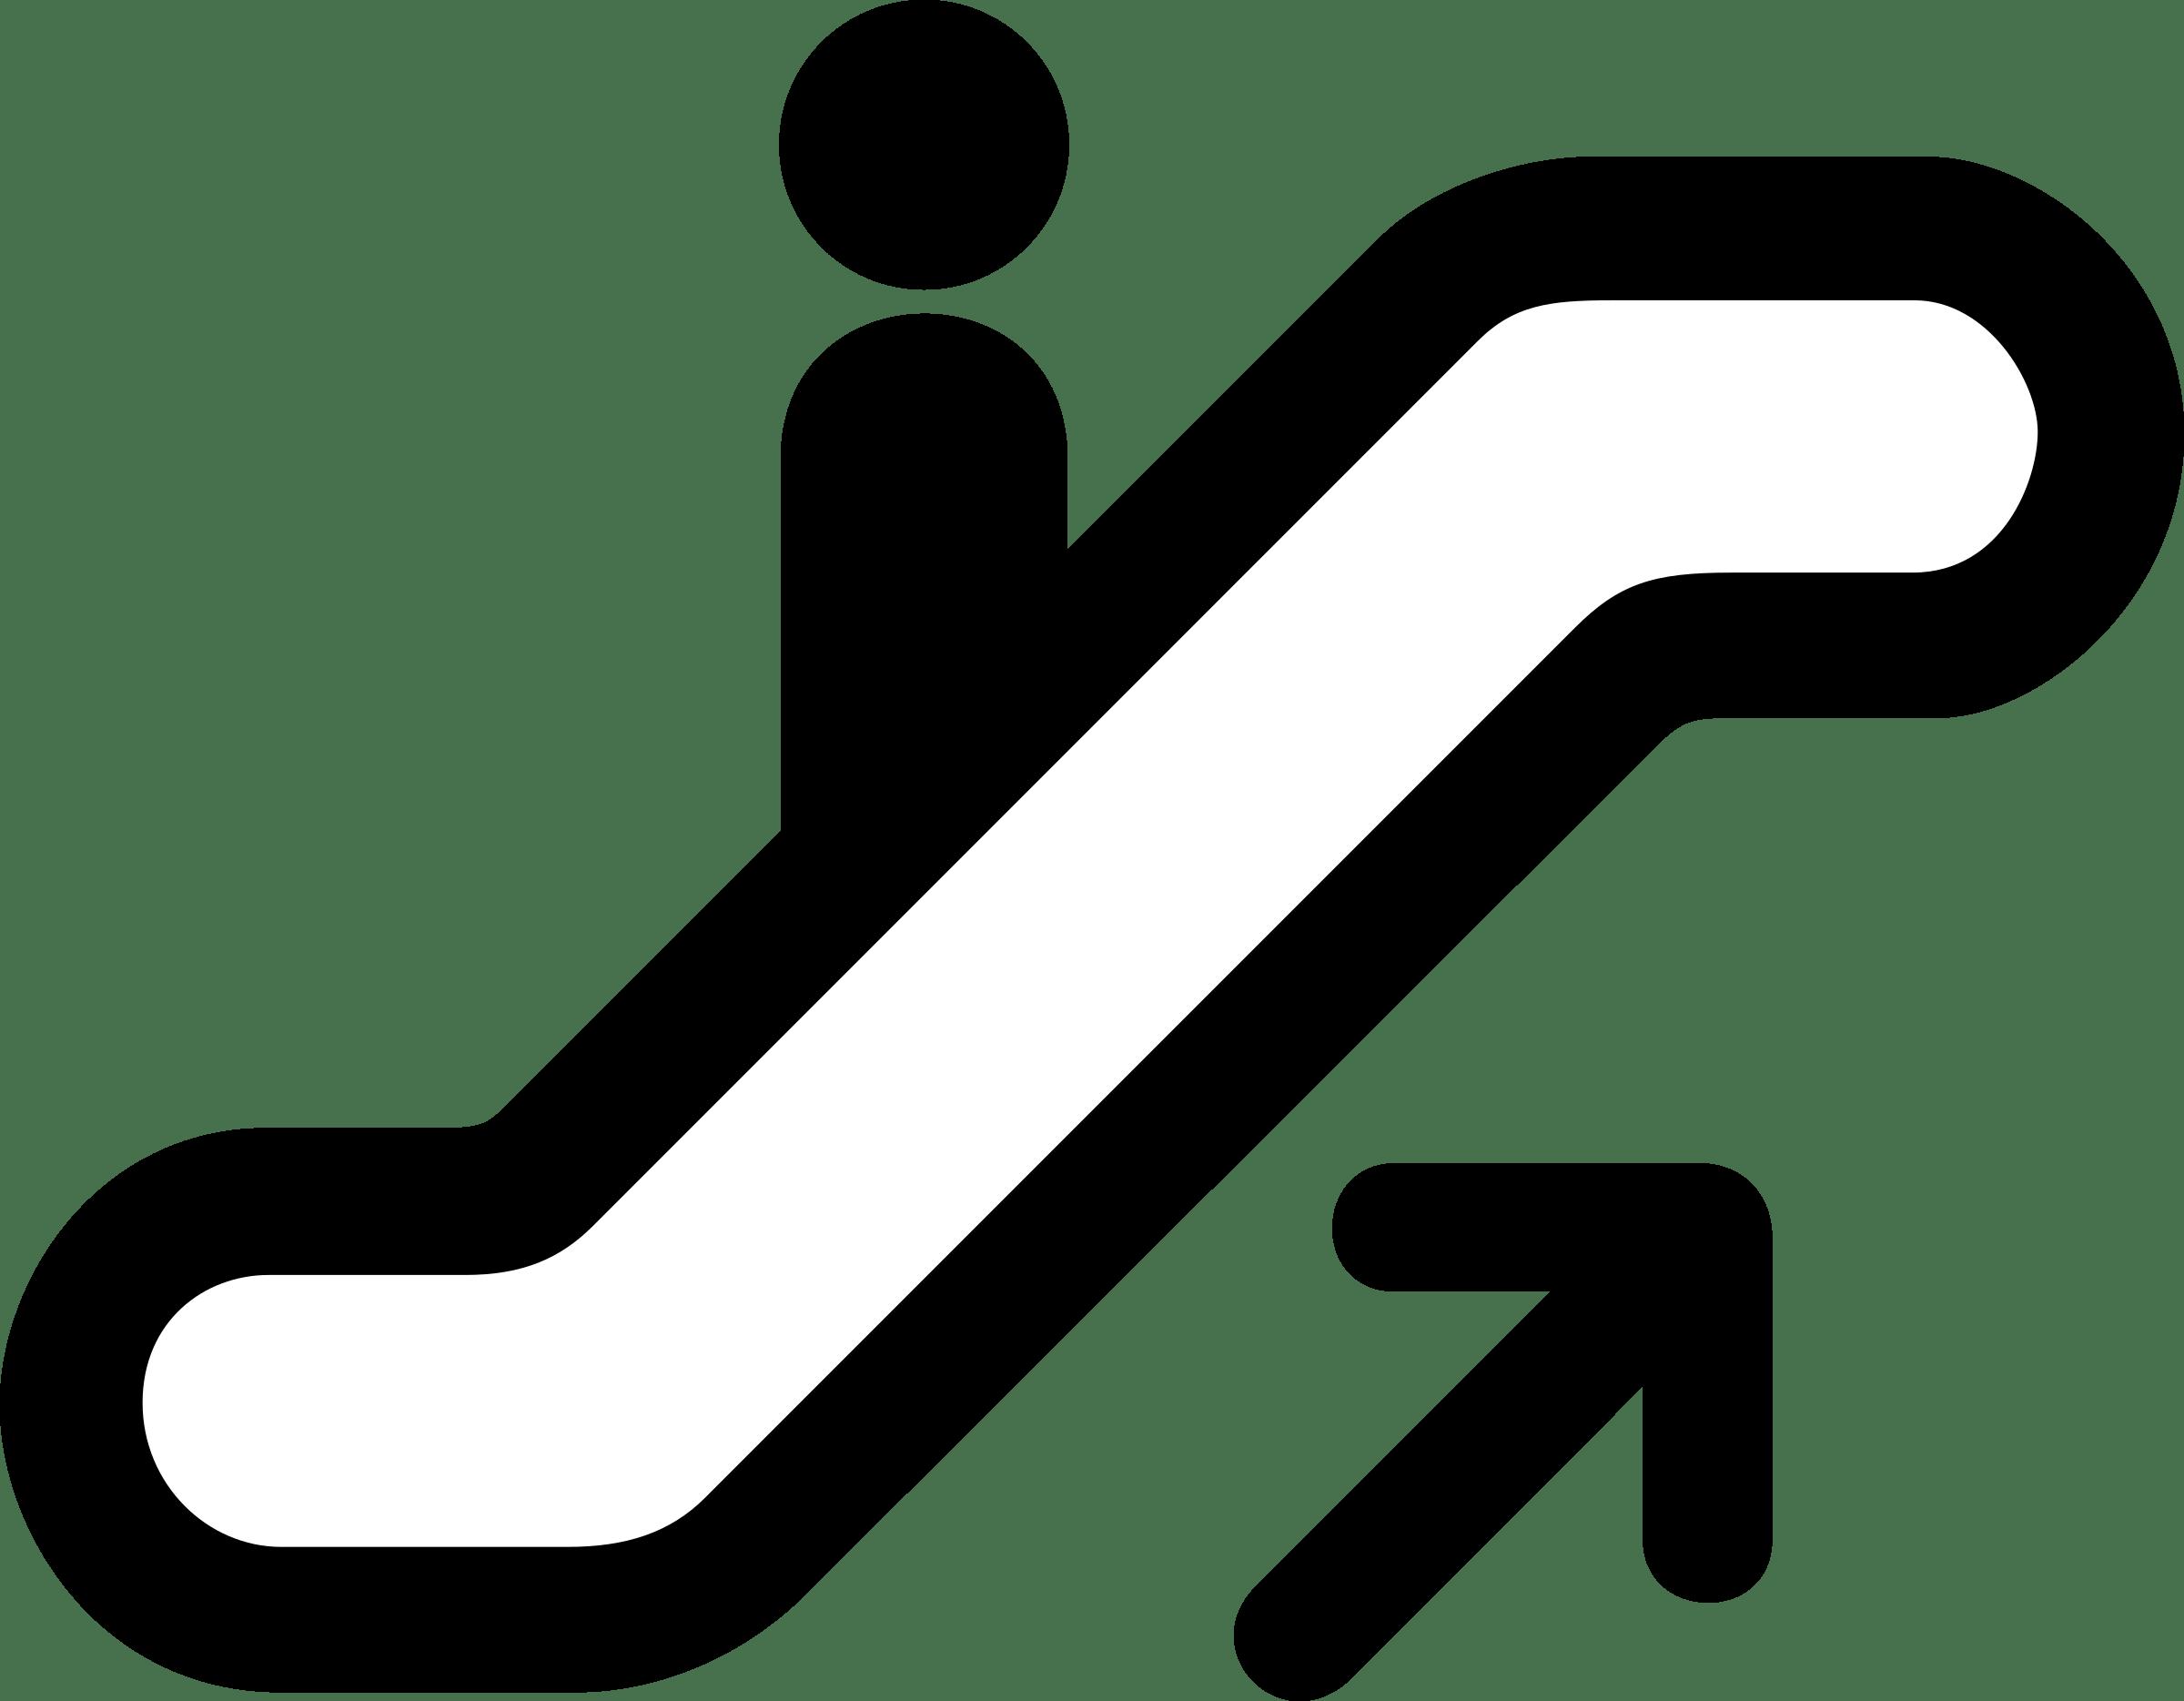 Escalator down transparent stickpng. Up clipart png